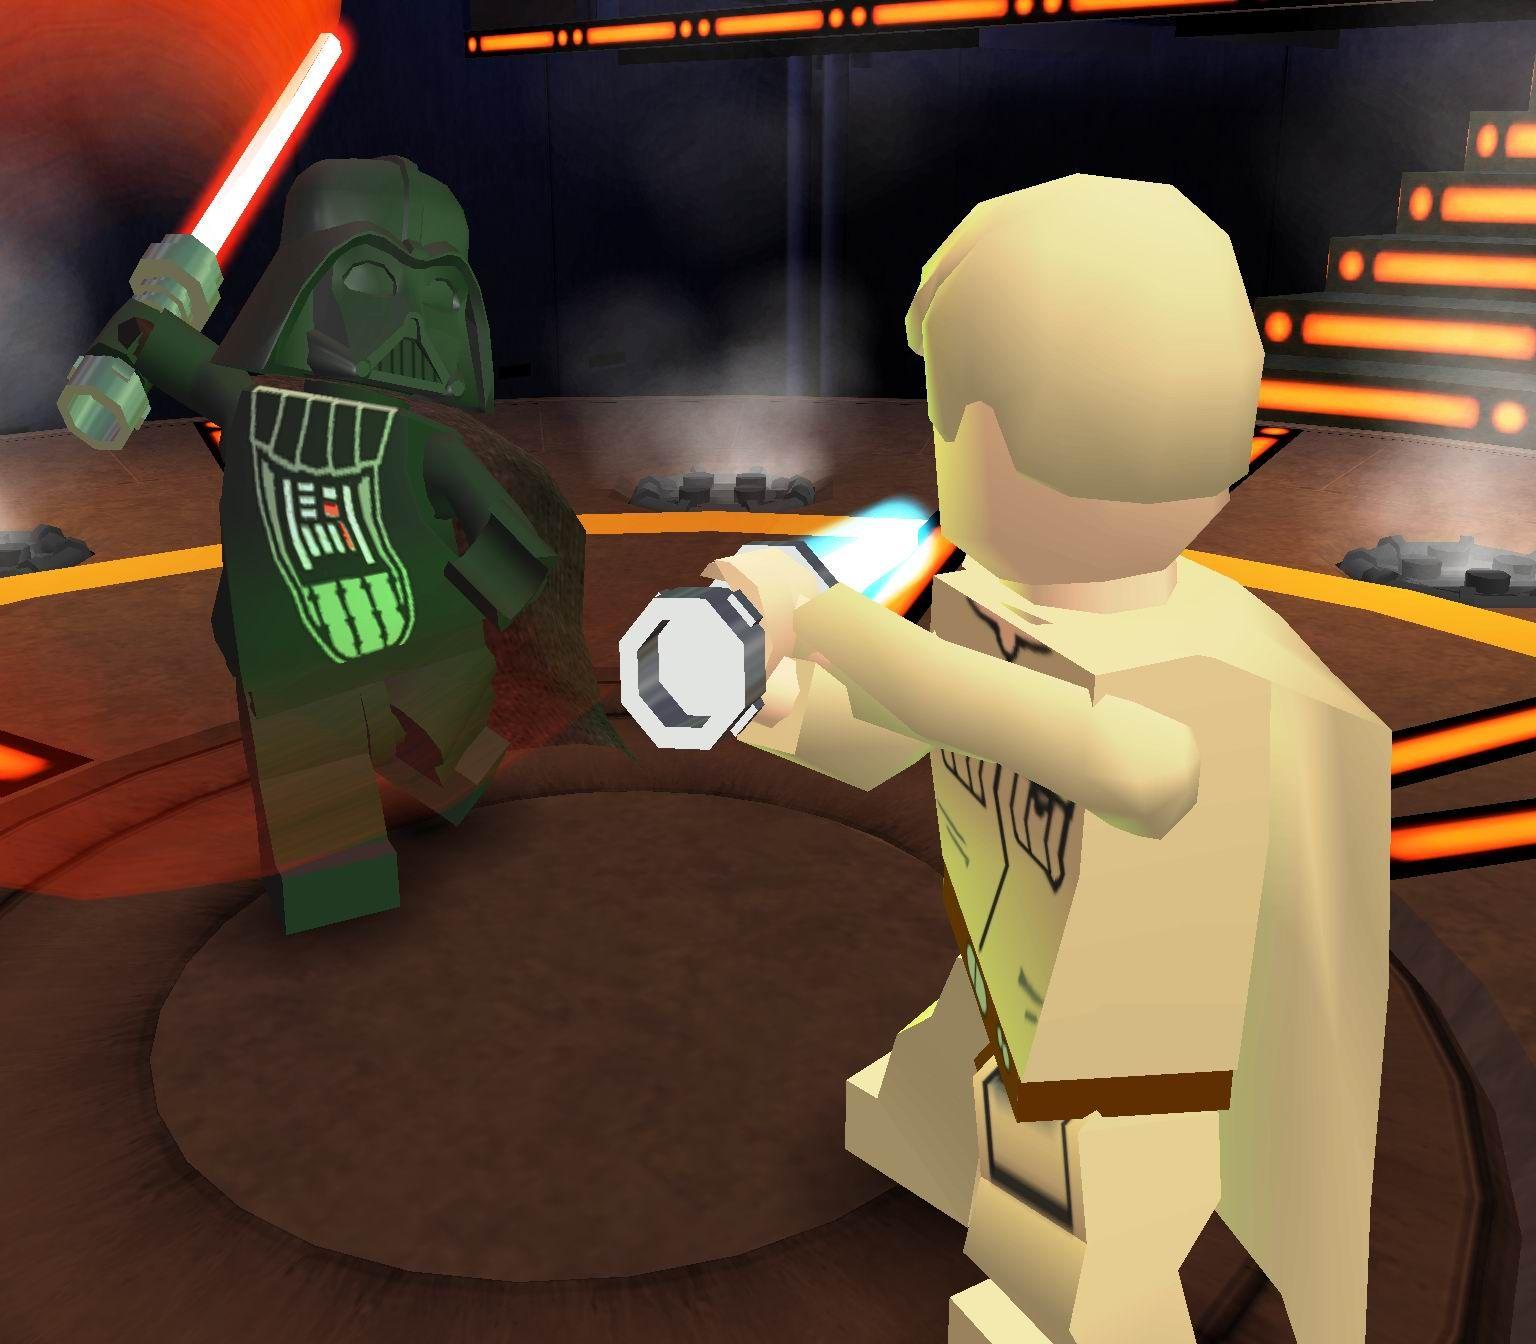 Lego Star Wars Ii The Original Trilogy Pc Review Gamewatcher